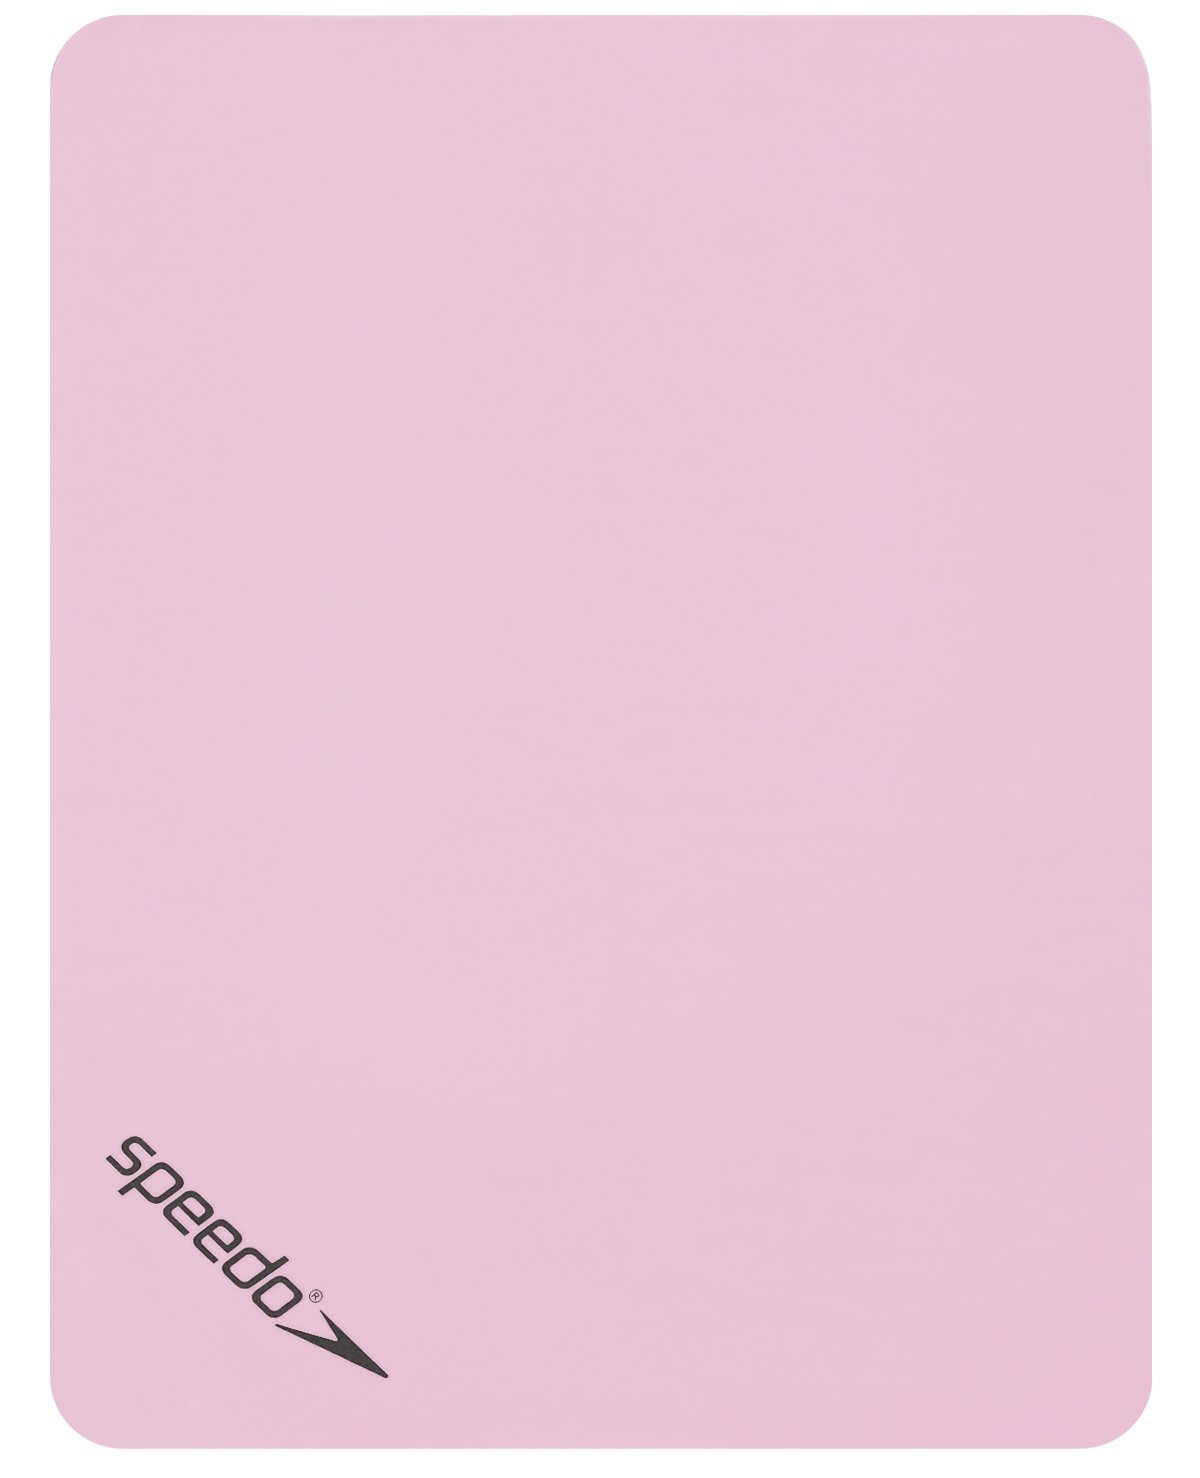 Speedo Sports Towel -Blue 753528